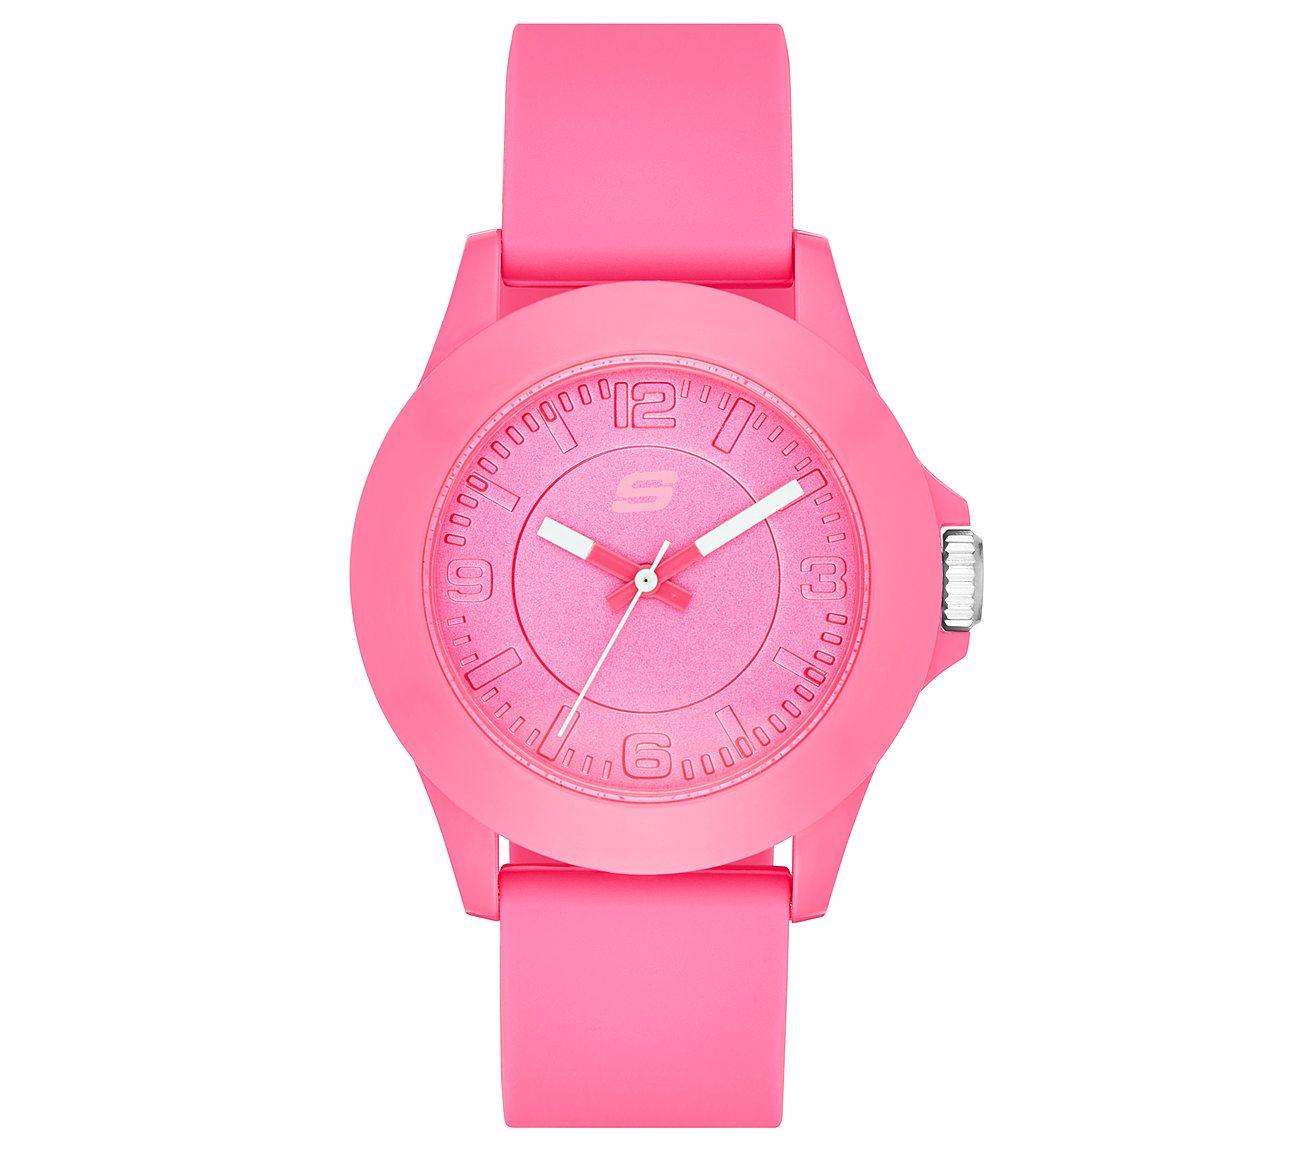 Rosencrans Midsize Watch